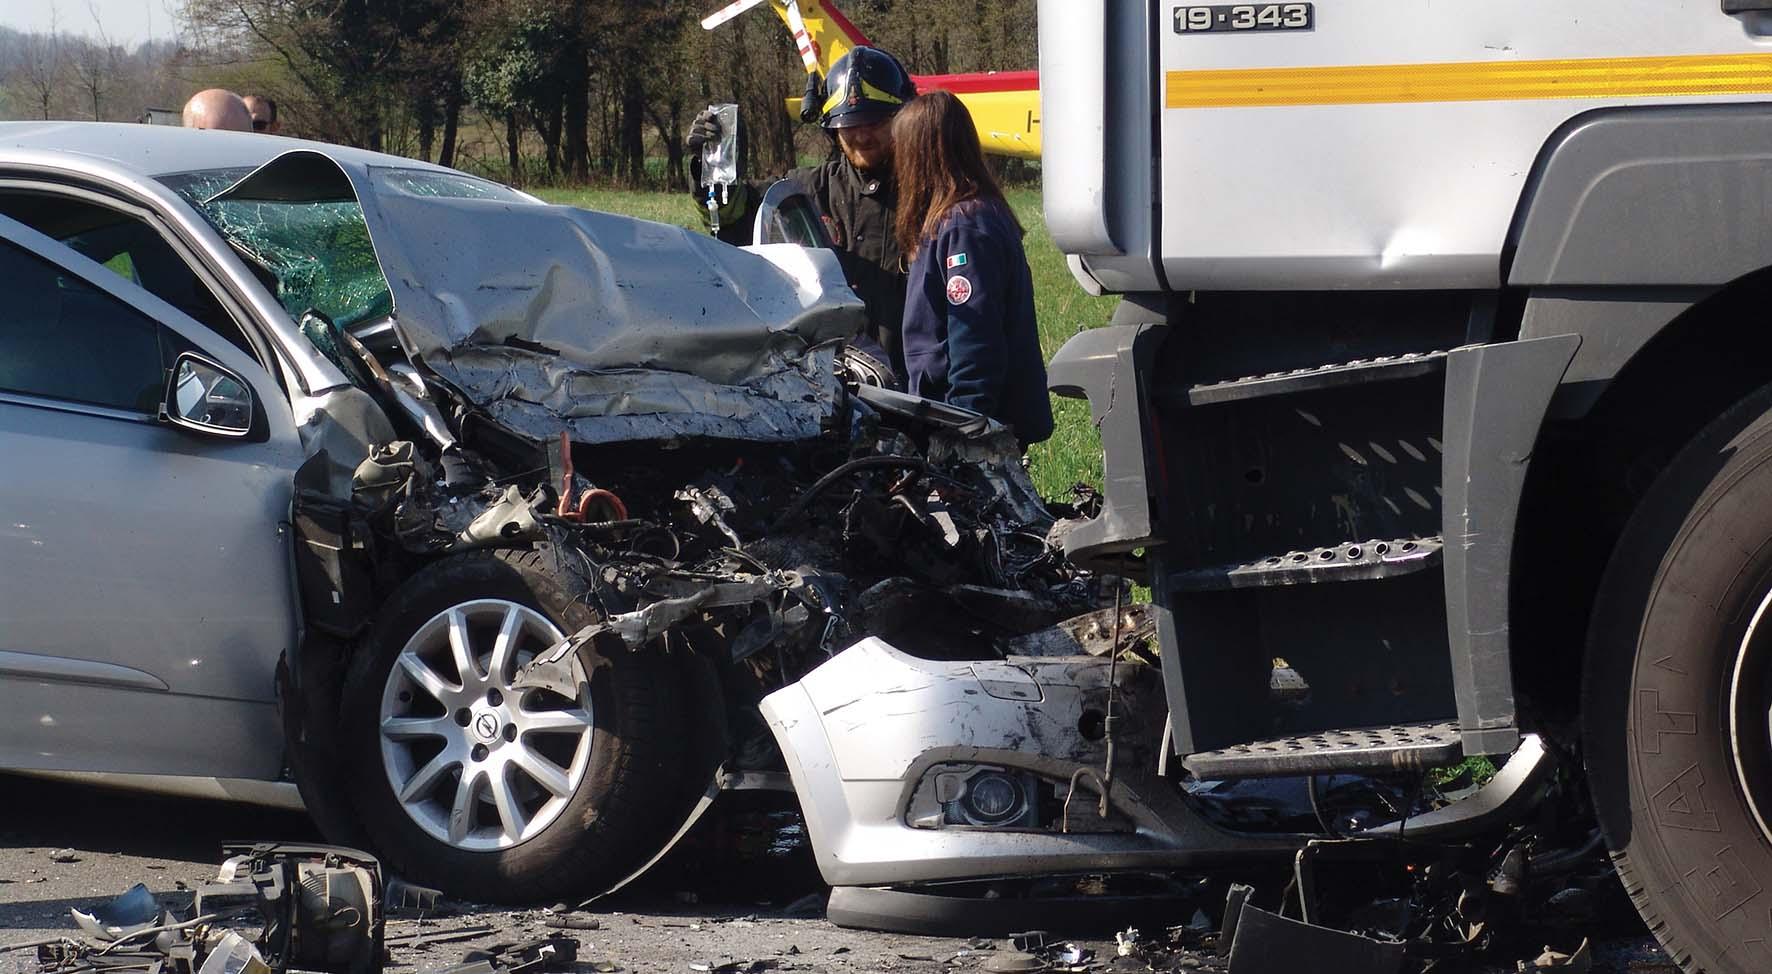 incidente stradale auto camion